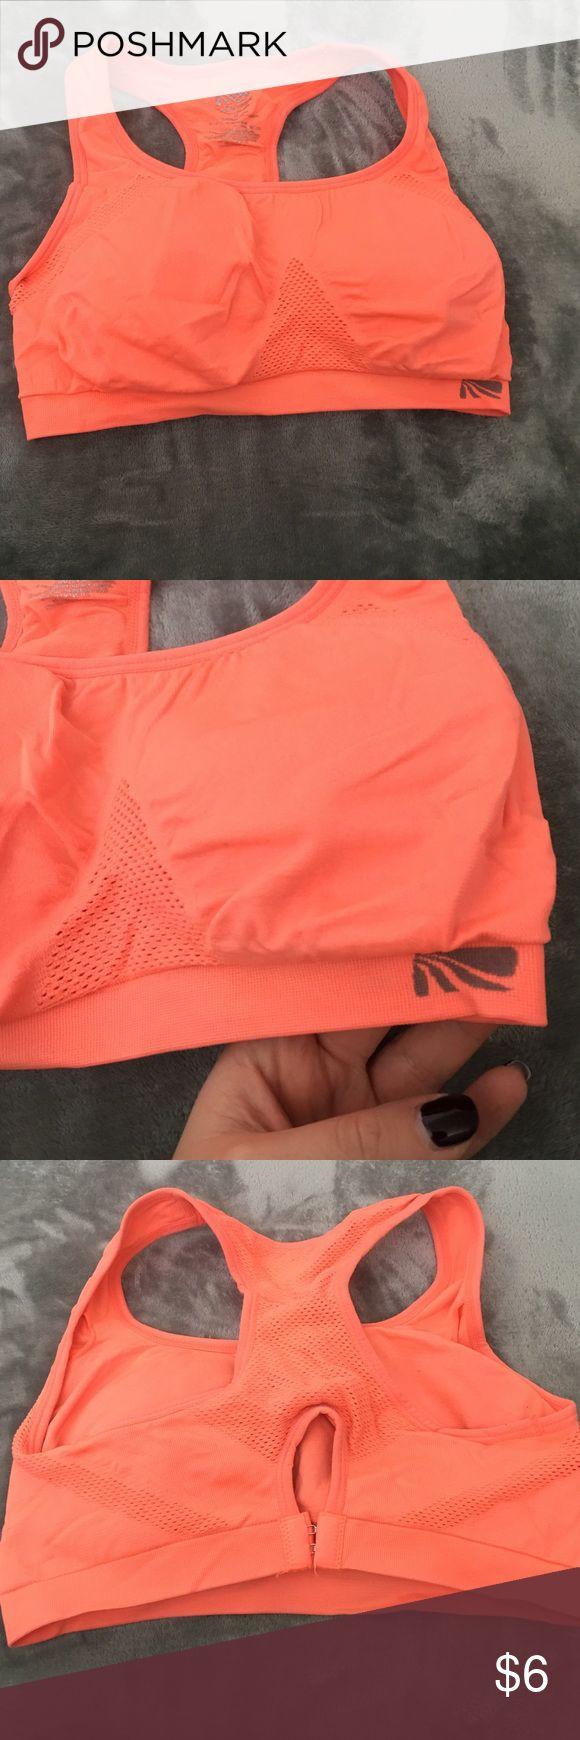 Neon orange sports bra size medium Used Marika magic neon orange sports bra in size medium. Marika Intimates & Sleepwear Bras